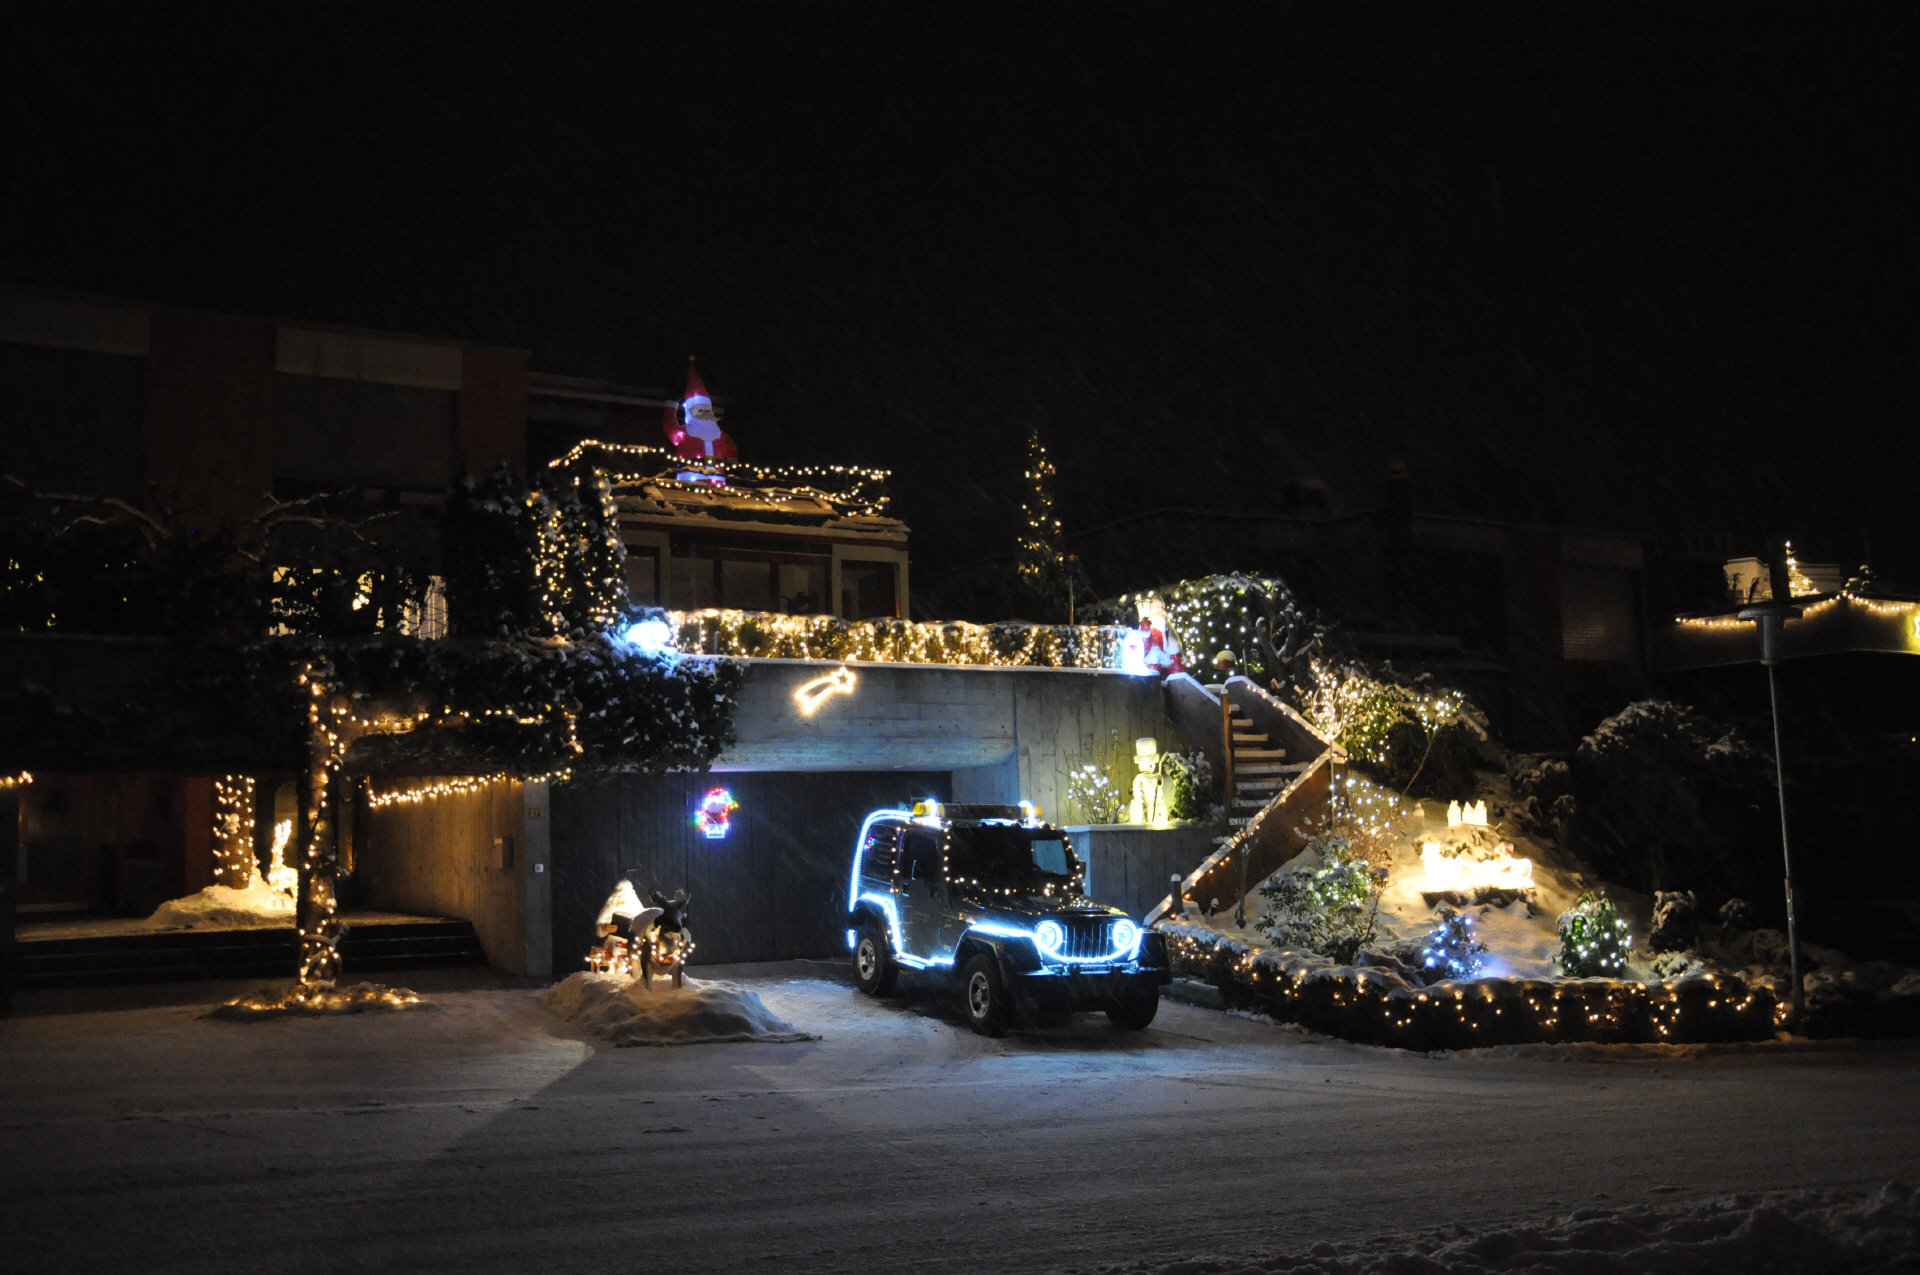 Haus Weihnachtsbeleuchtung.Haus Weihnachtsbeleuchtung